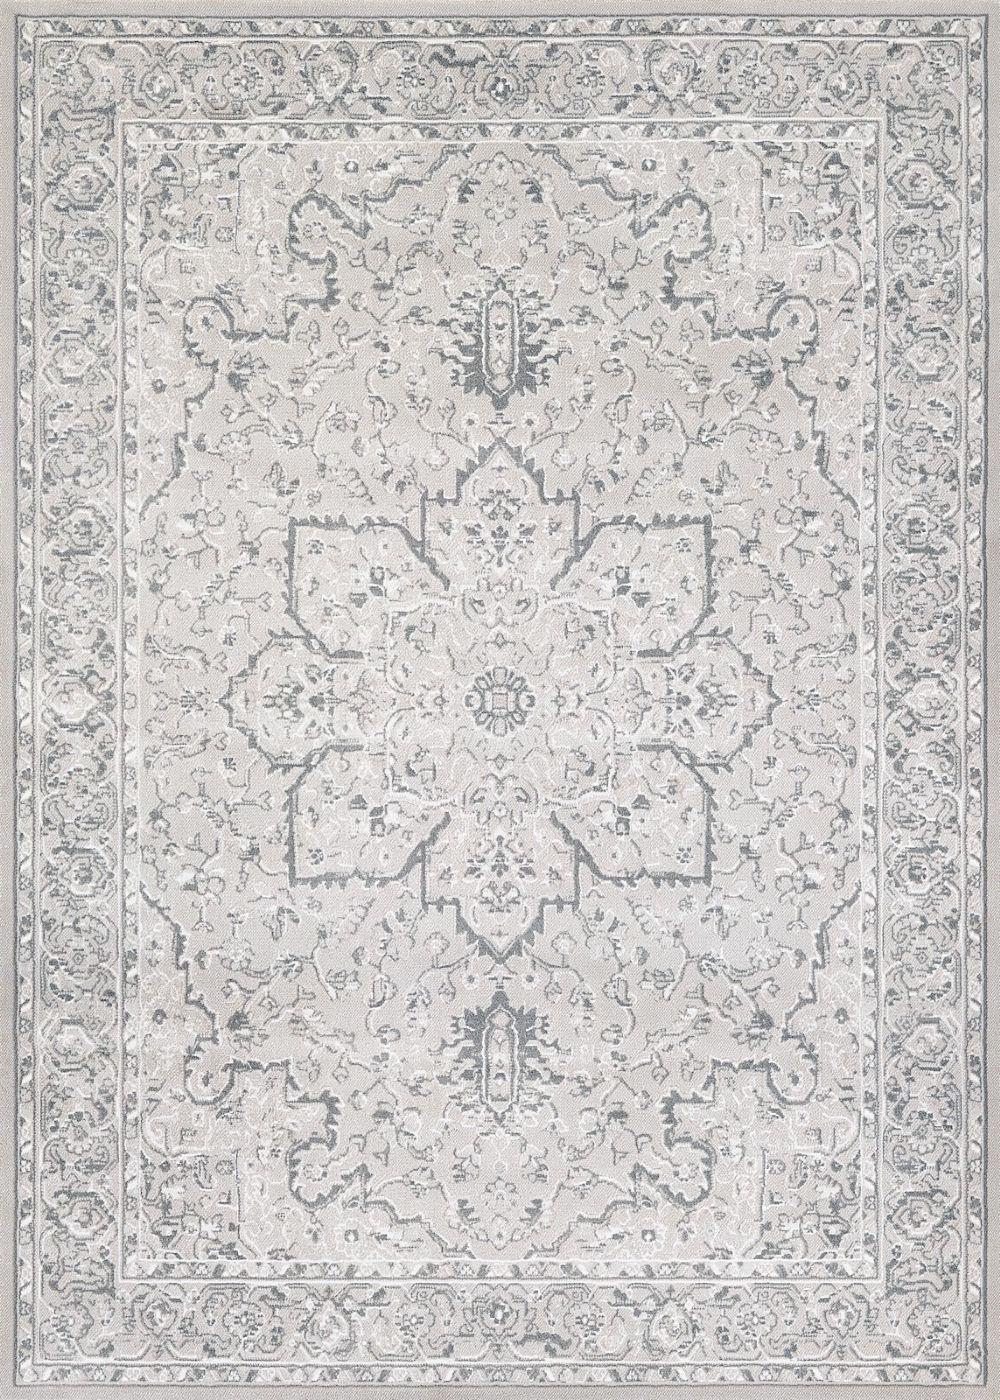 couristan marina traditional area rug collection